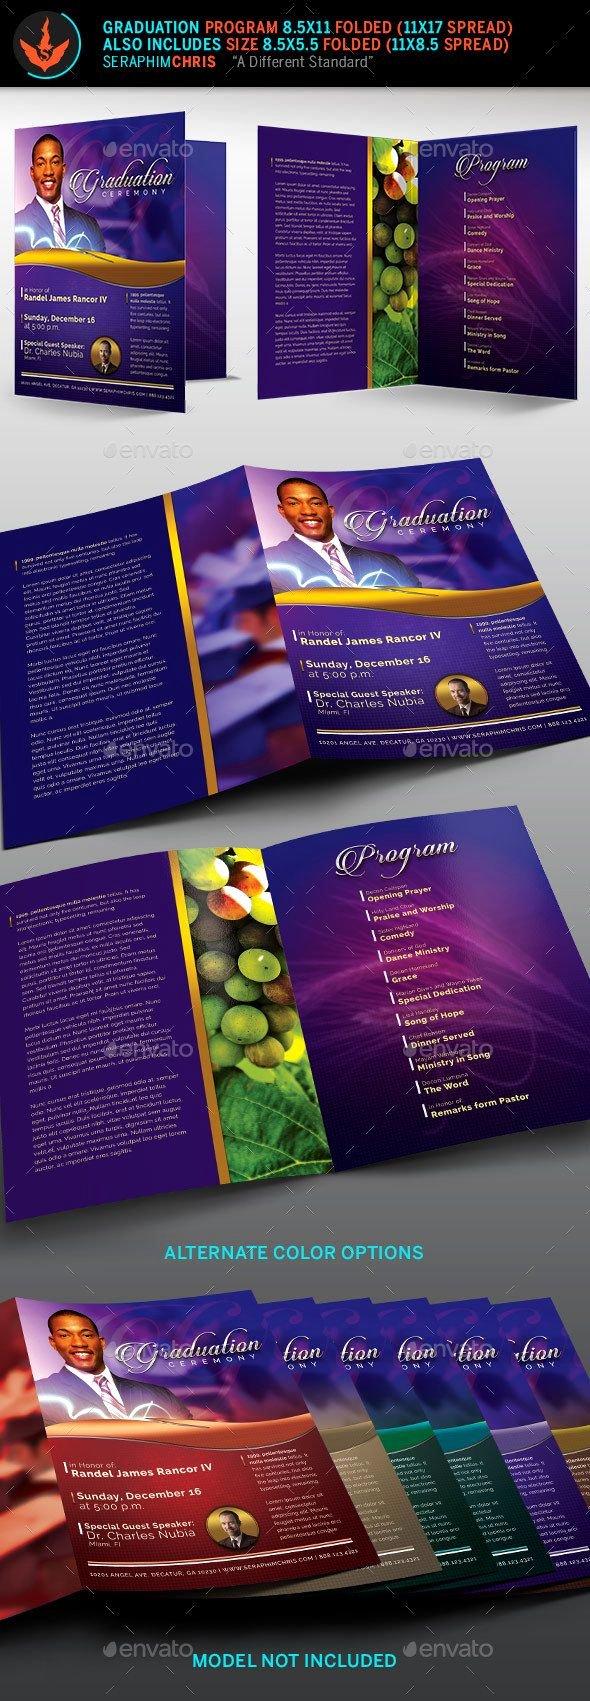 Graduation Ceremony Program Template Lovely Pastor S Graduation Ceremony Program Template